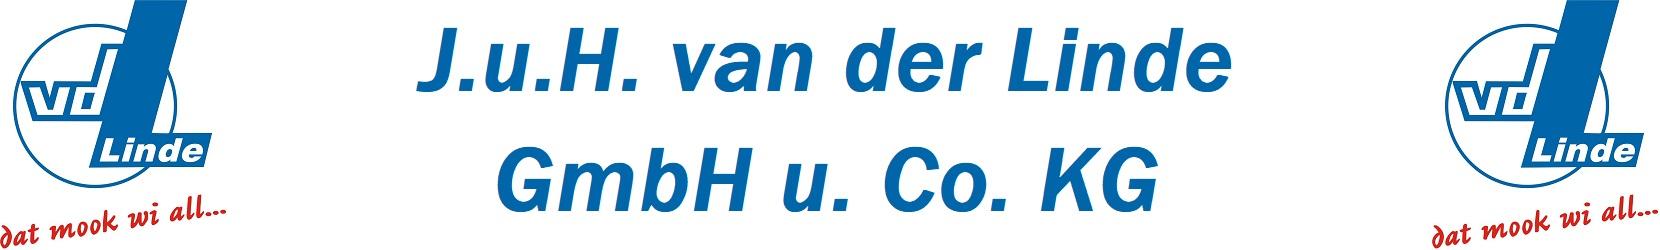 J.u.H. van der Linde GmbH u. Co. KG